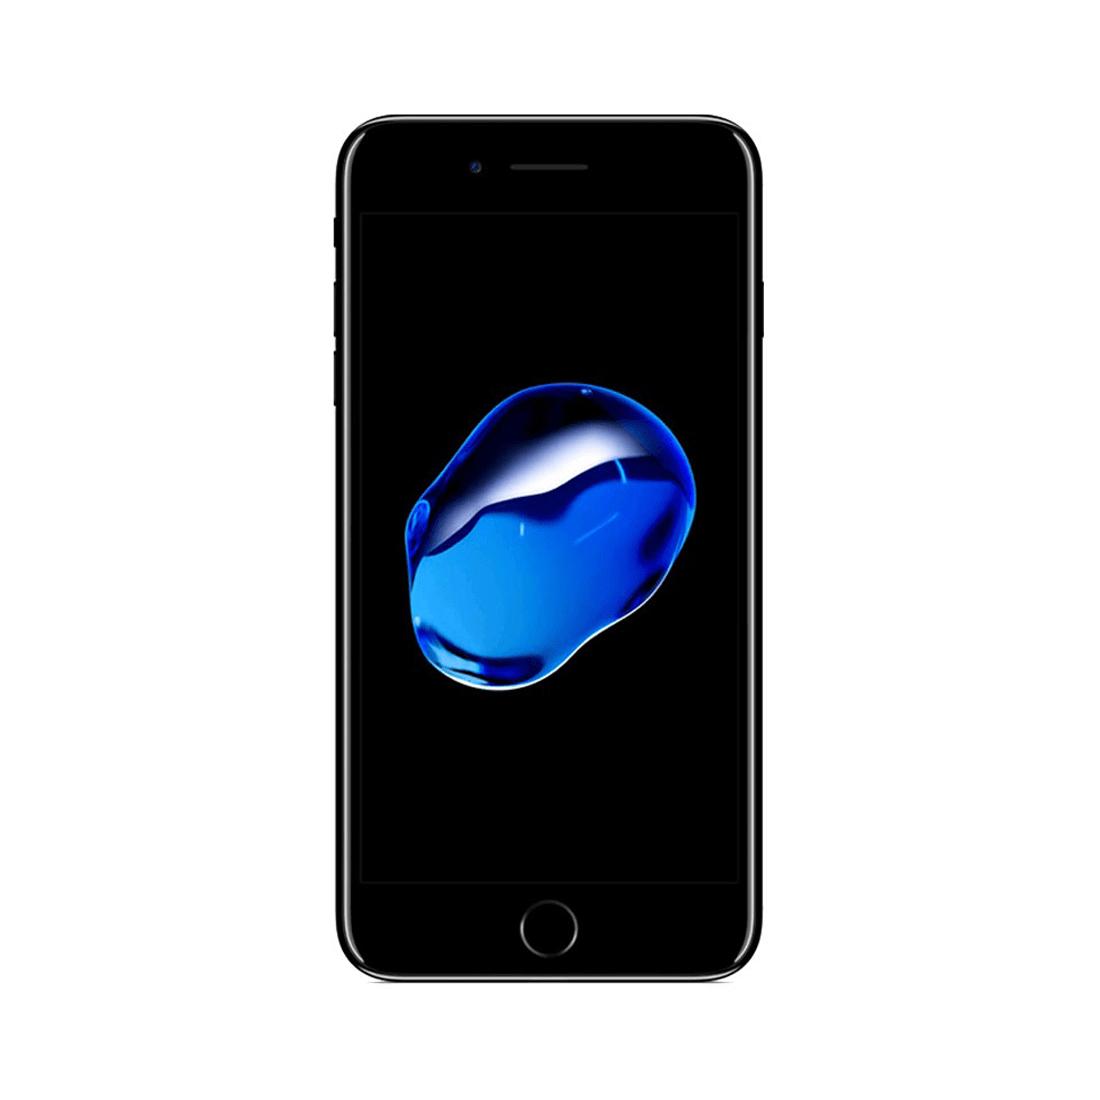 apple iphone 7 plus black 32gb and 256gb. Black Bedroom Furniture Sets. Home Design Ideas